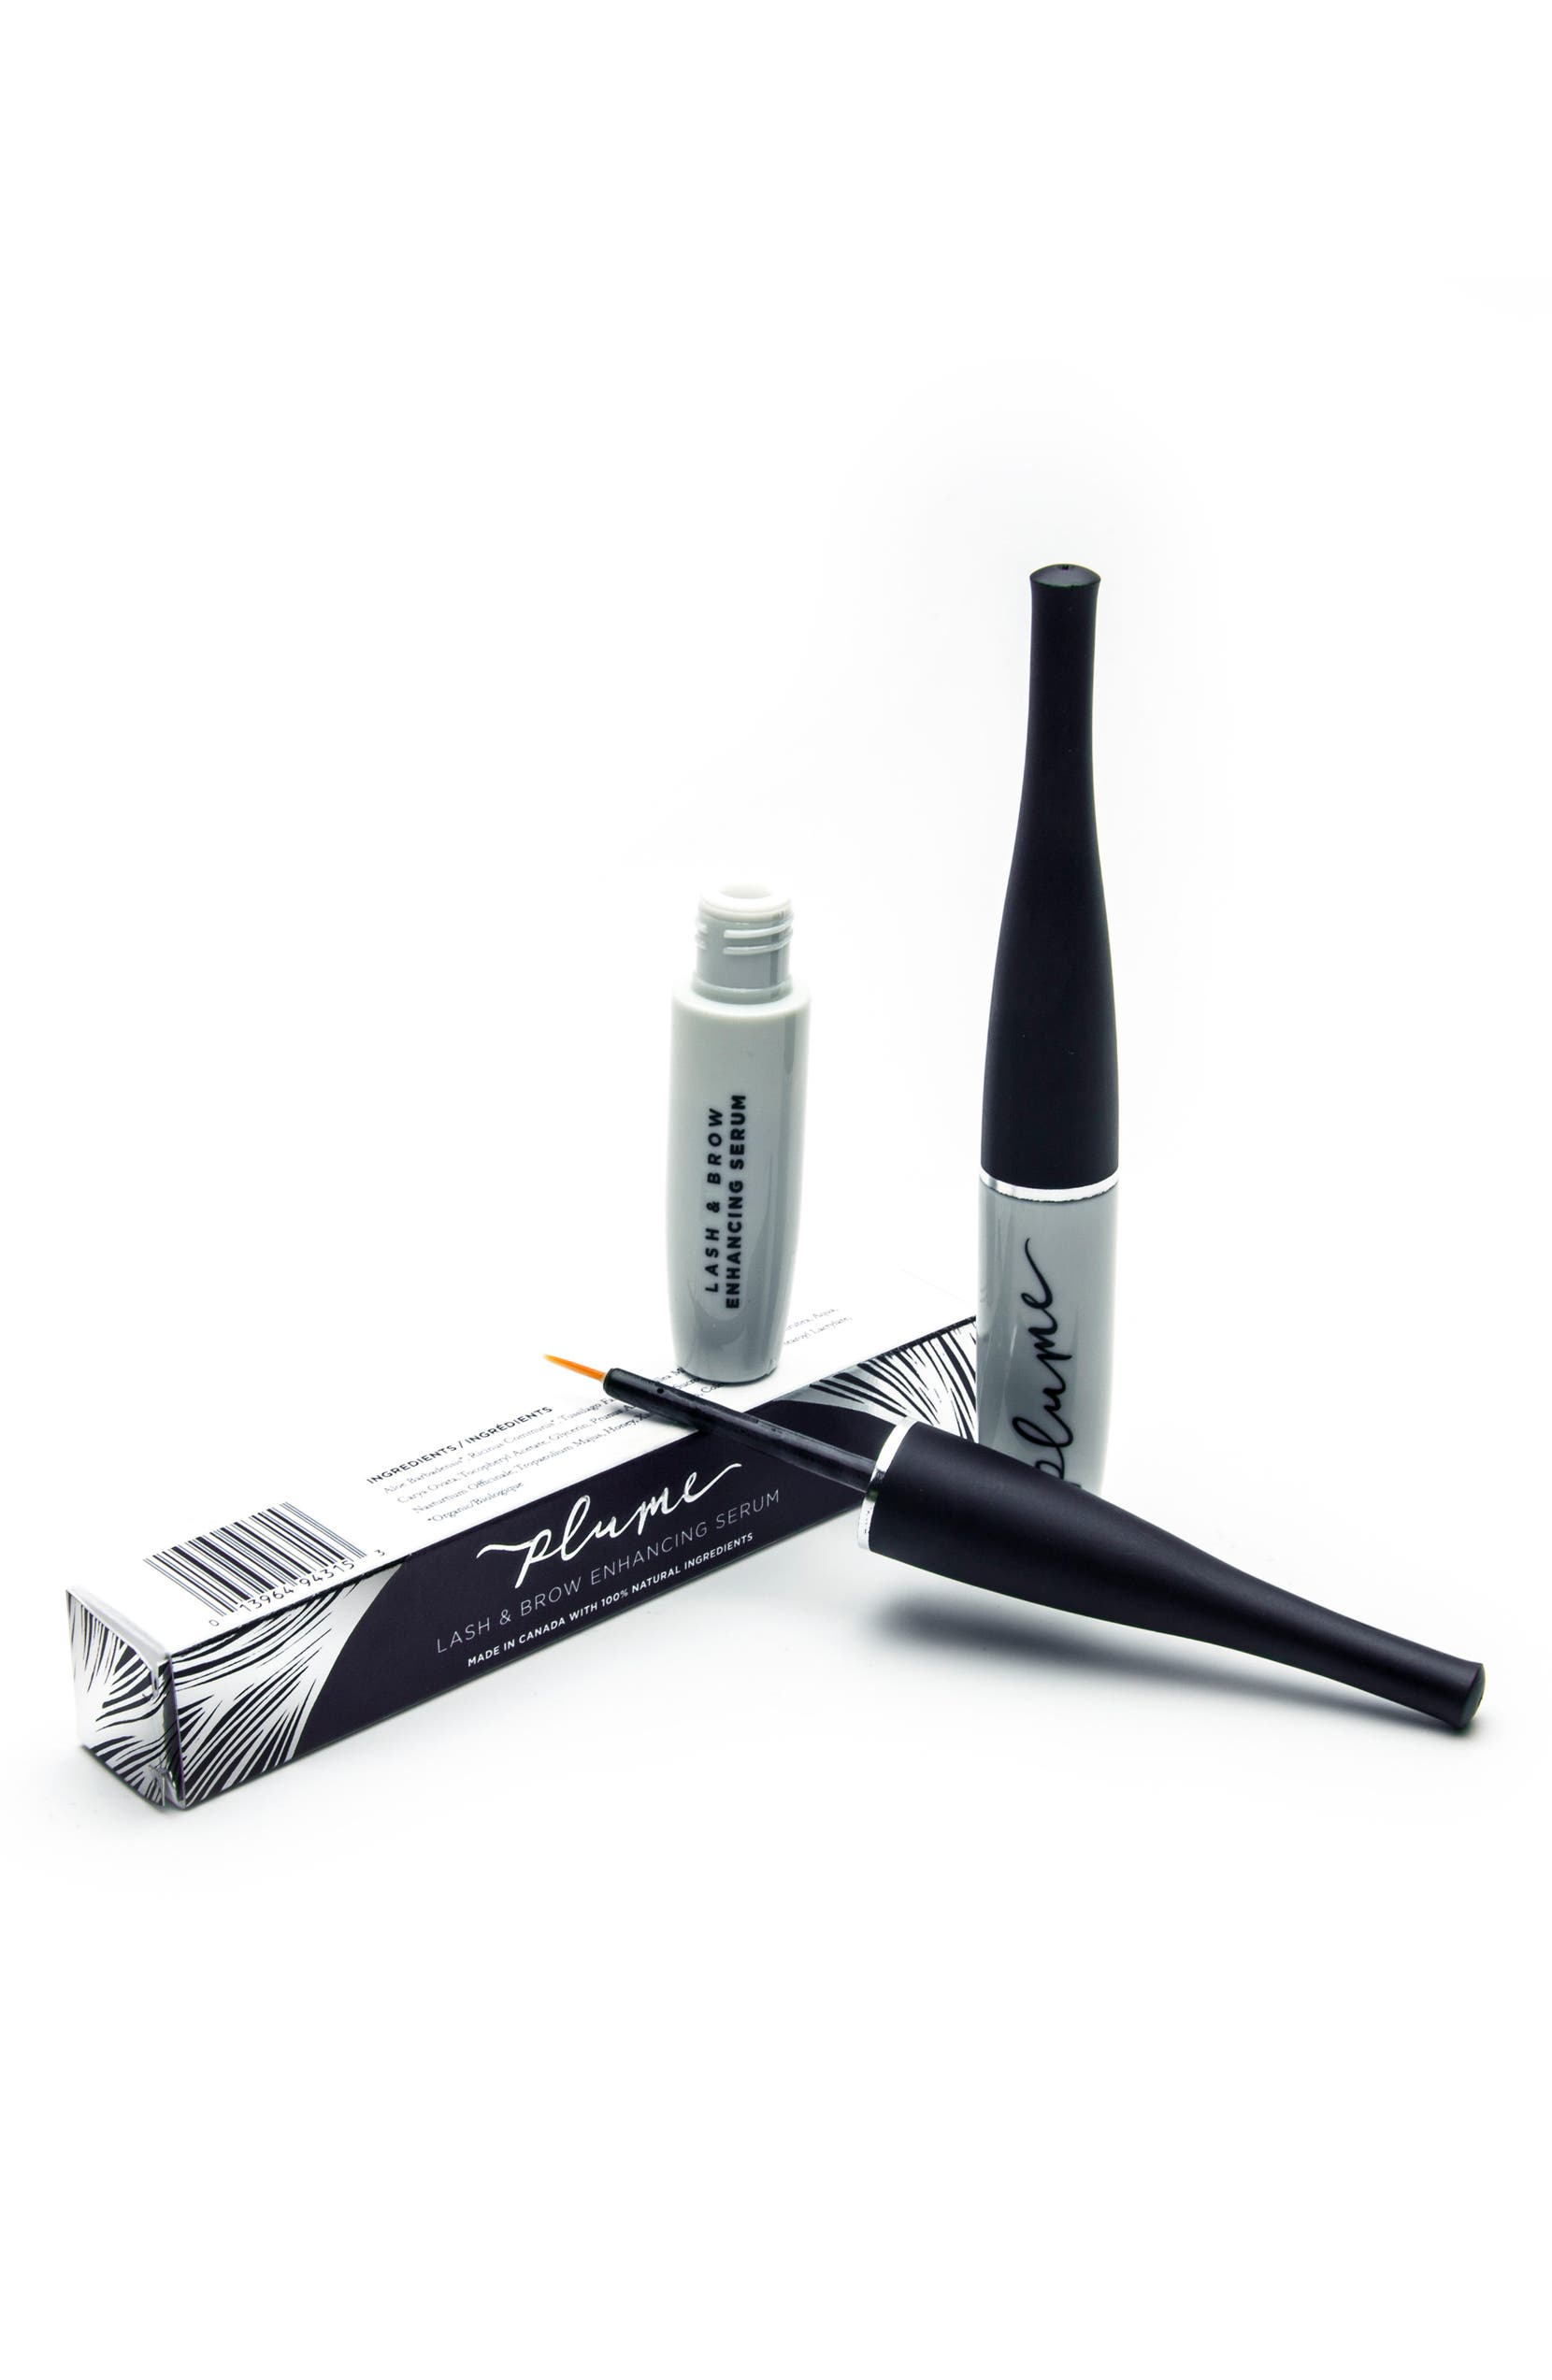 Plume Cosmetics Lash Brow Enhancing Serum Nordstrom